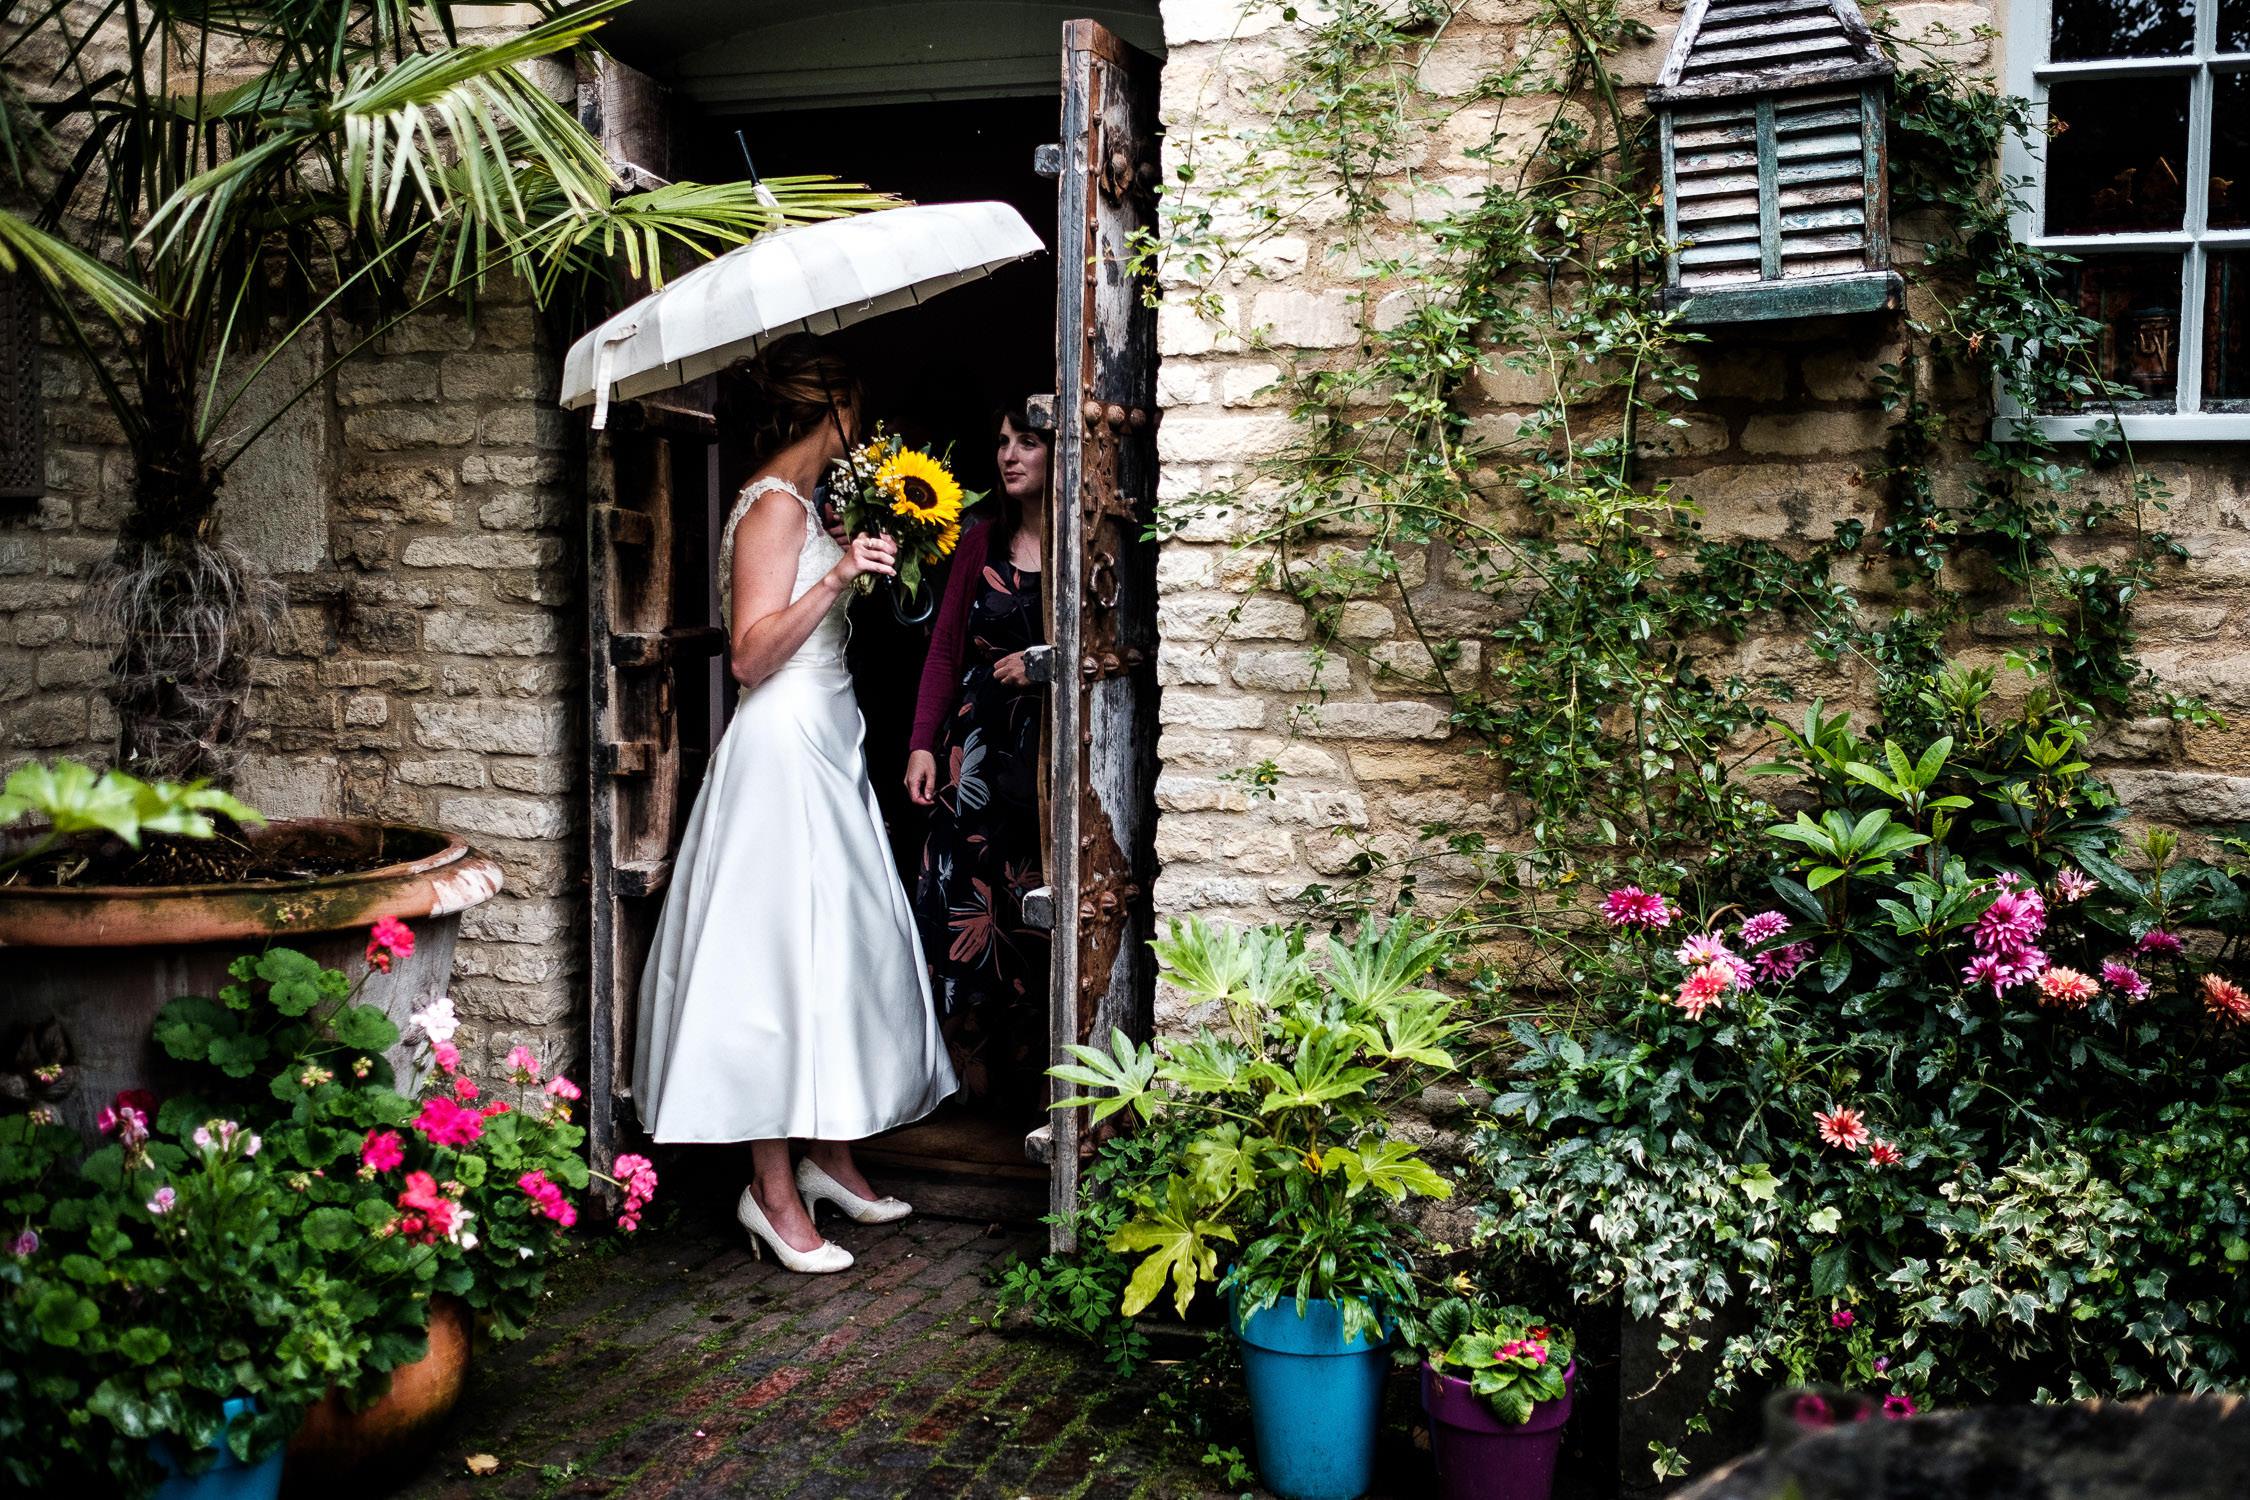 bride standing outside under umbrella